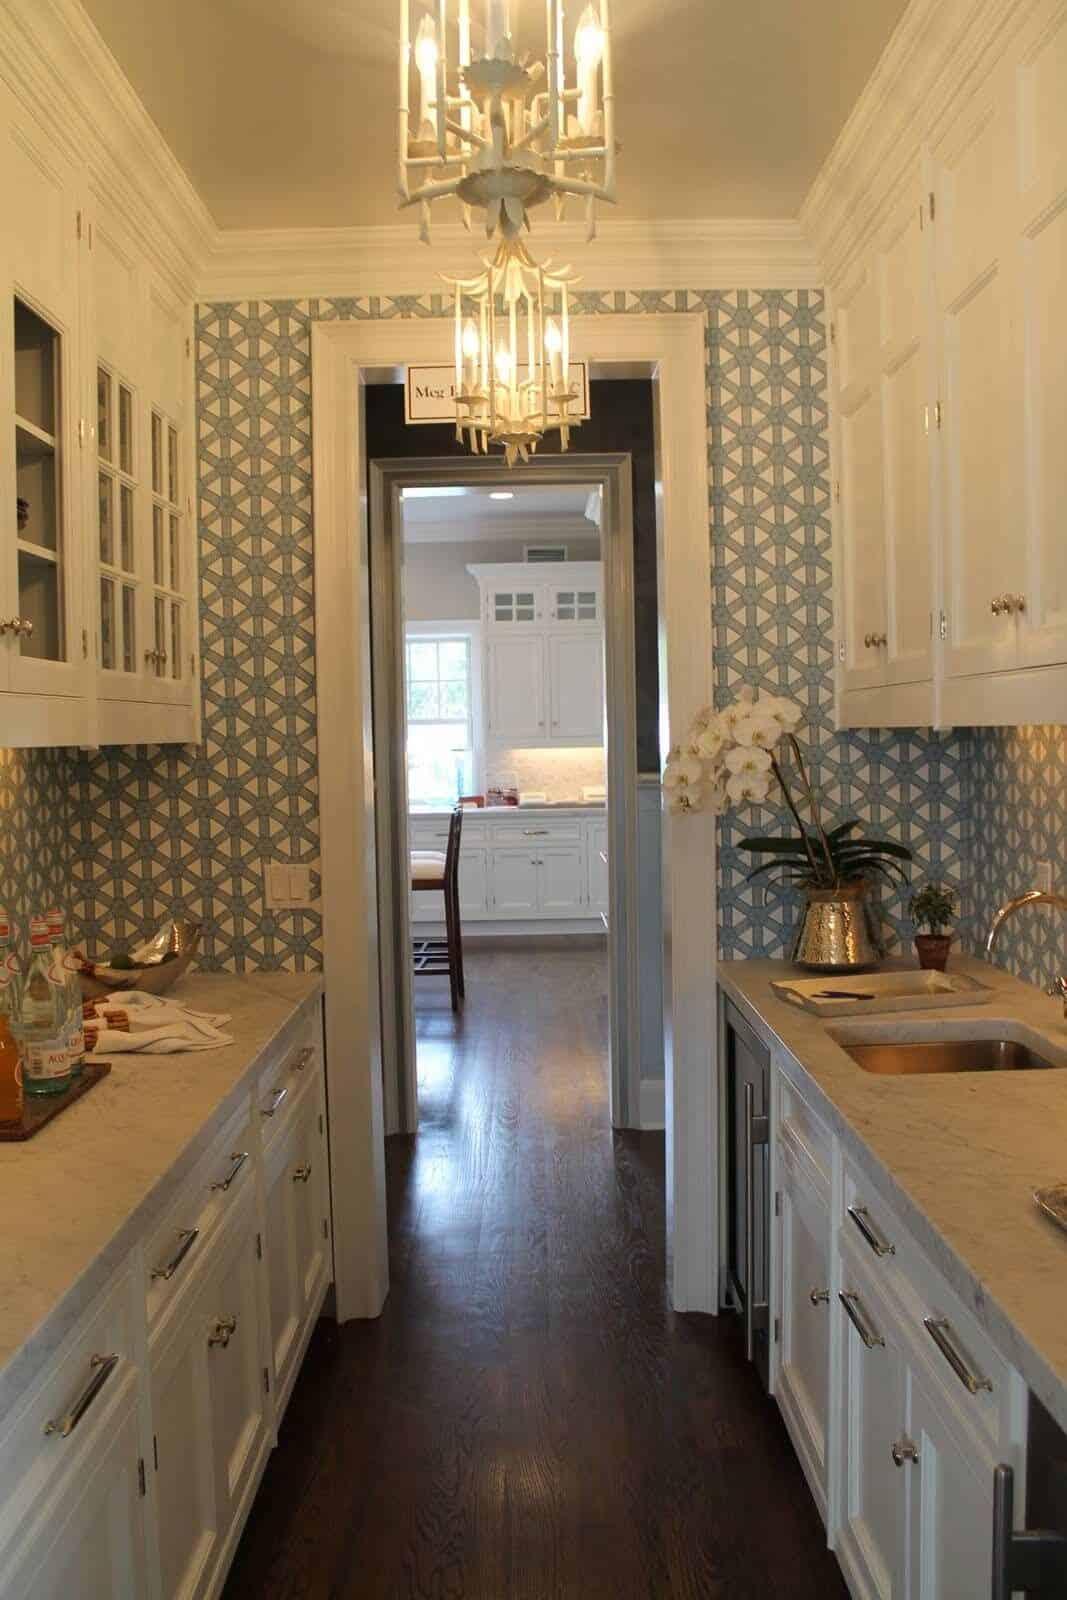 wallpaper small kitchen